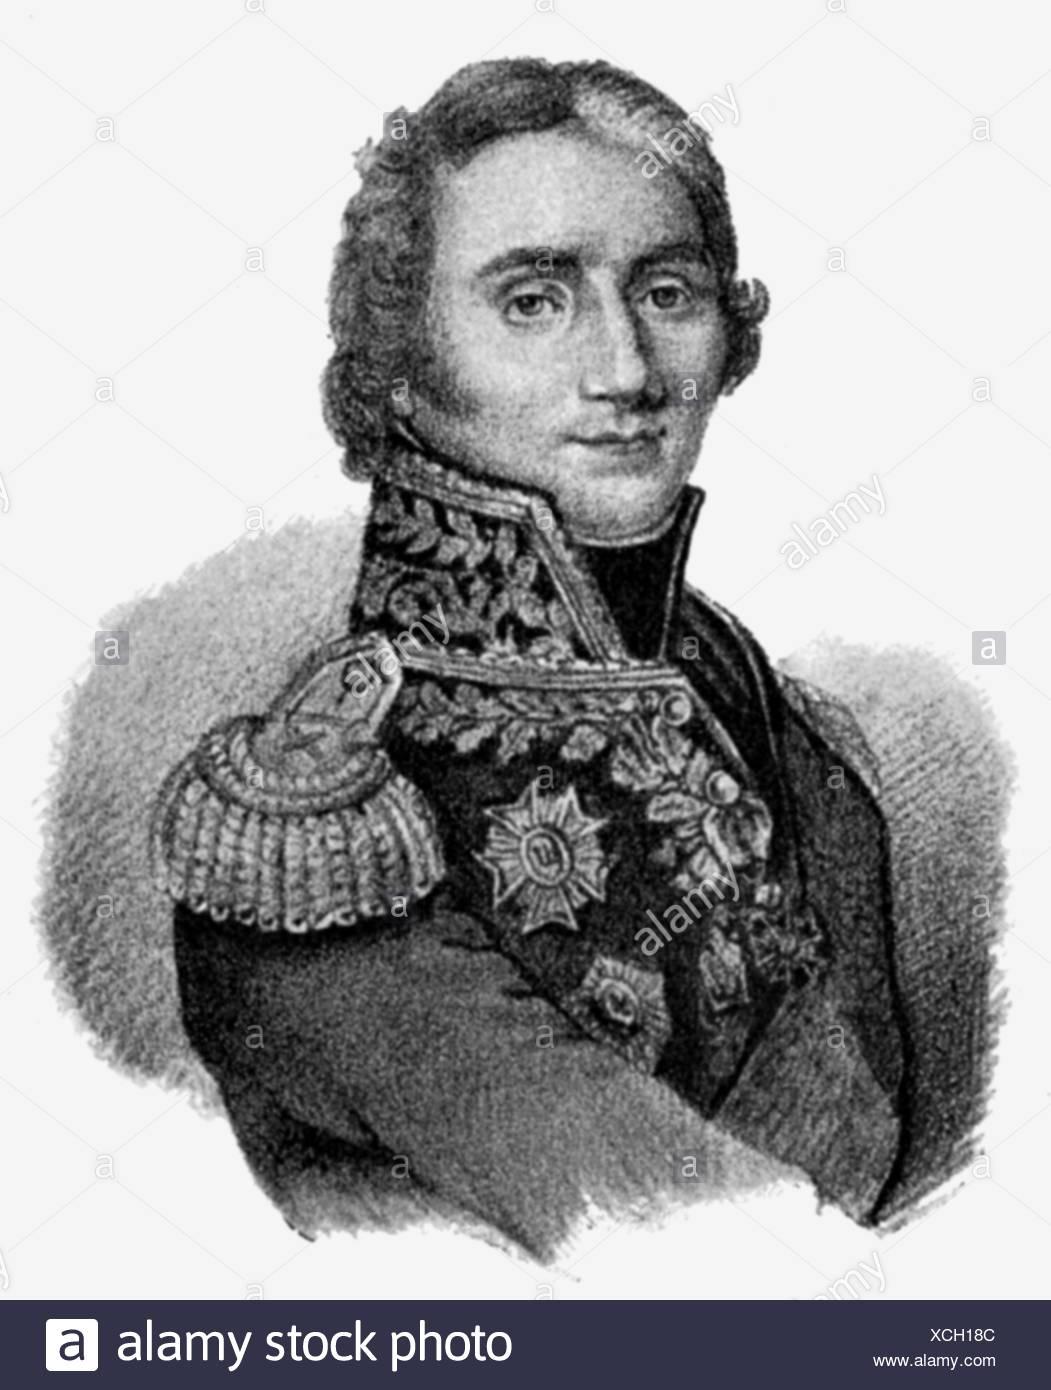 Masséna, André, 6.5.1756 - 14.4.1817, French general, portrait, lithograph, 19th century, , Stock Photo